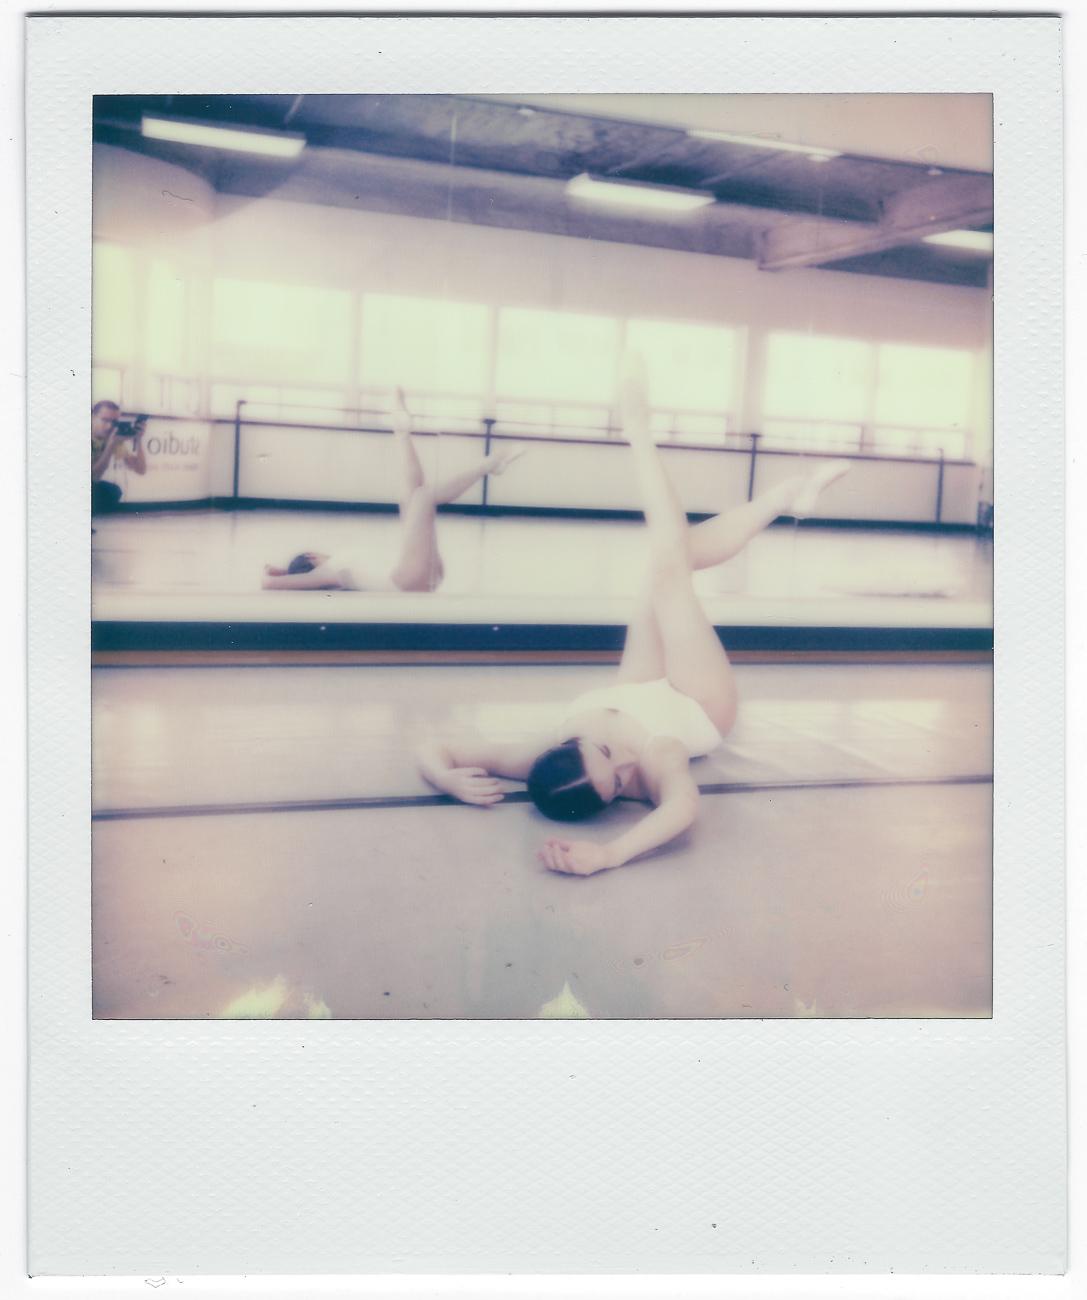 couleur polaroid one step plus ballet